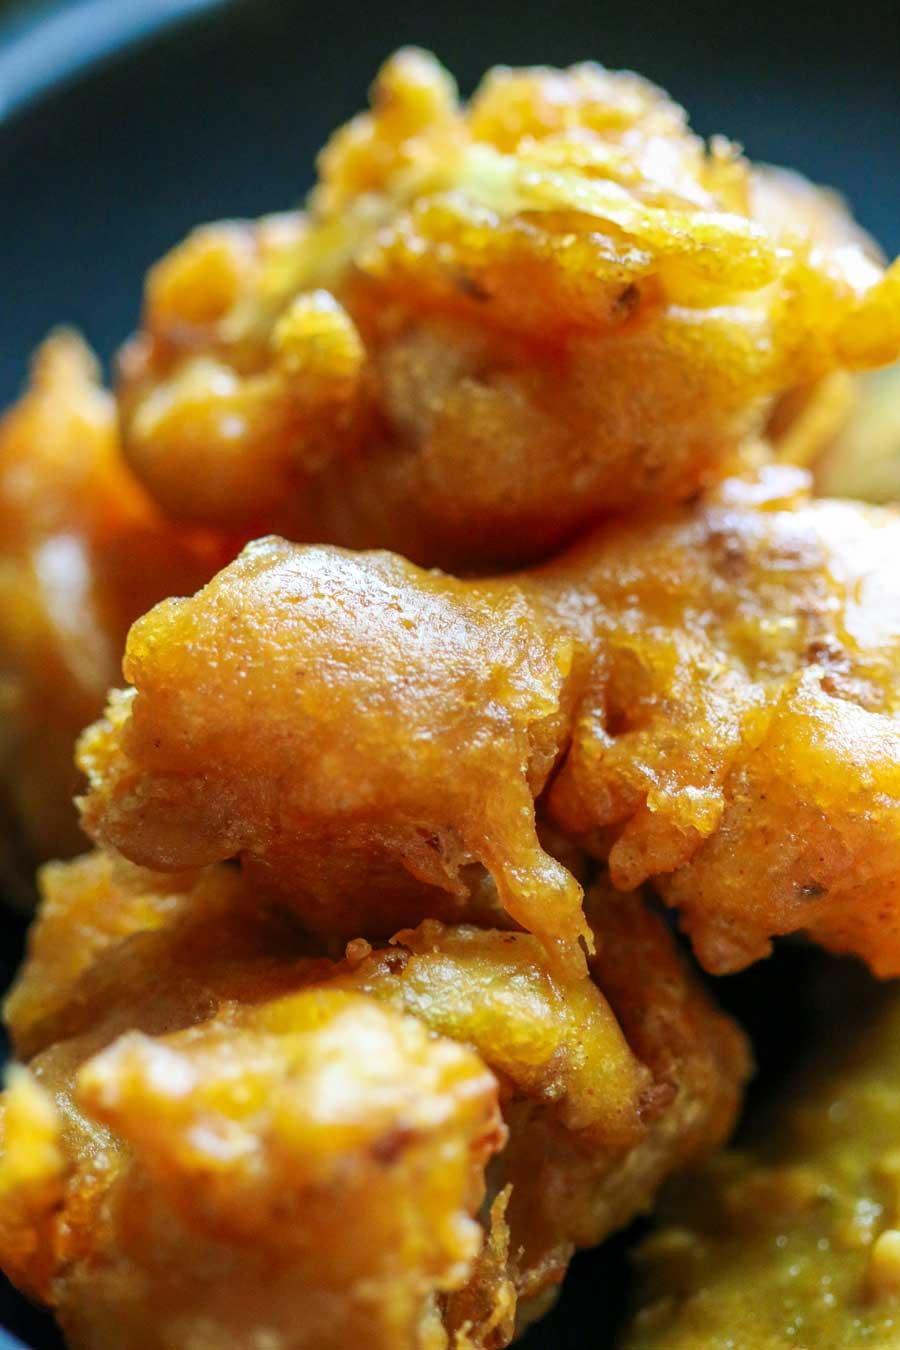 Nuggets de chou-fleur au curcuma et garam masala